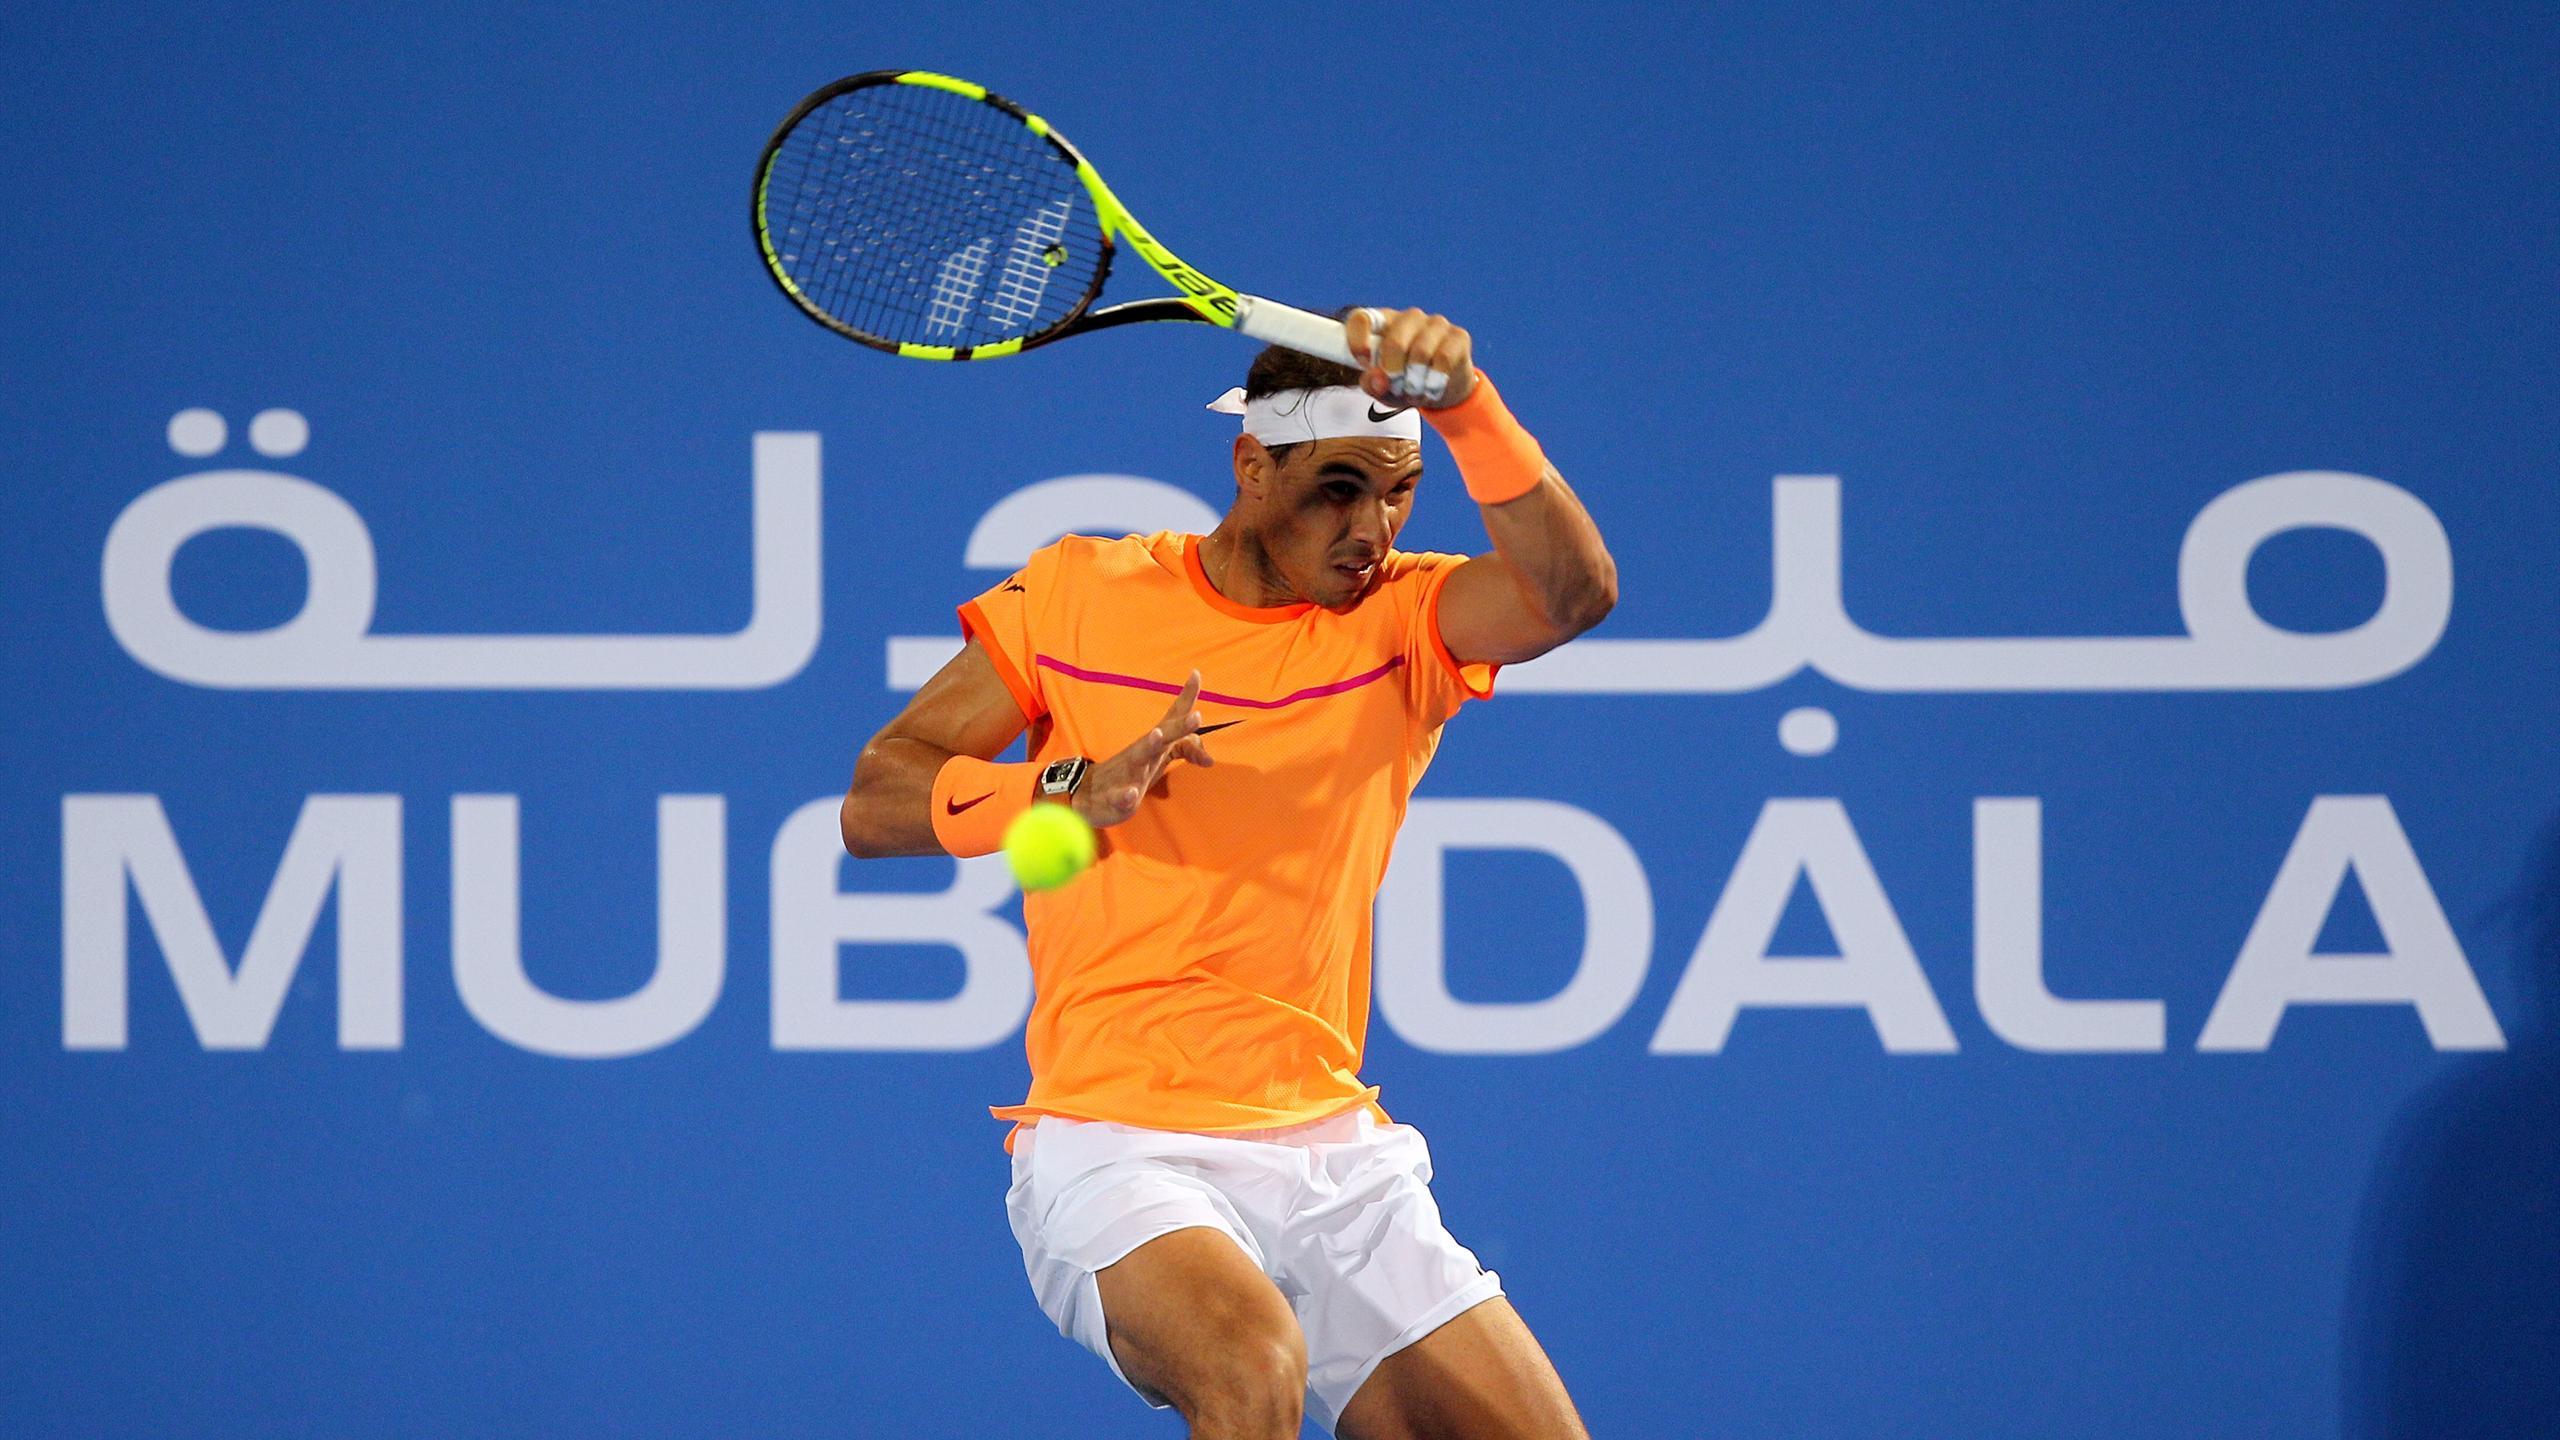 Rafael Nadal lors du tournoi d'Abou Dhabi